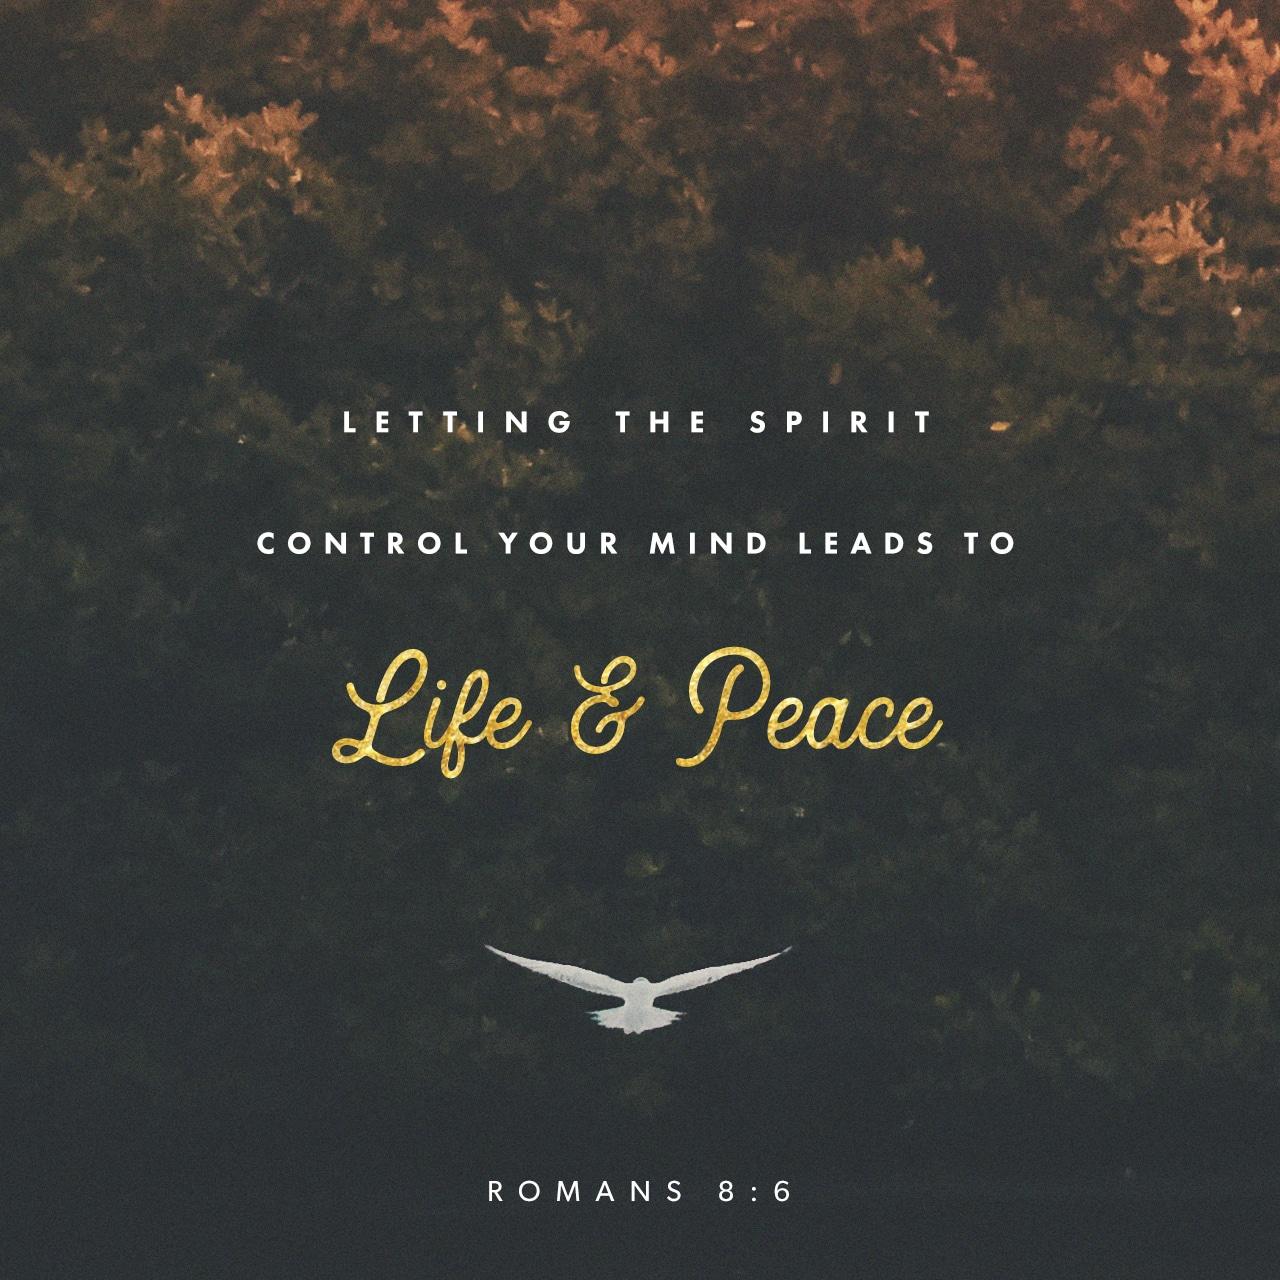 Romans 8:6-8